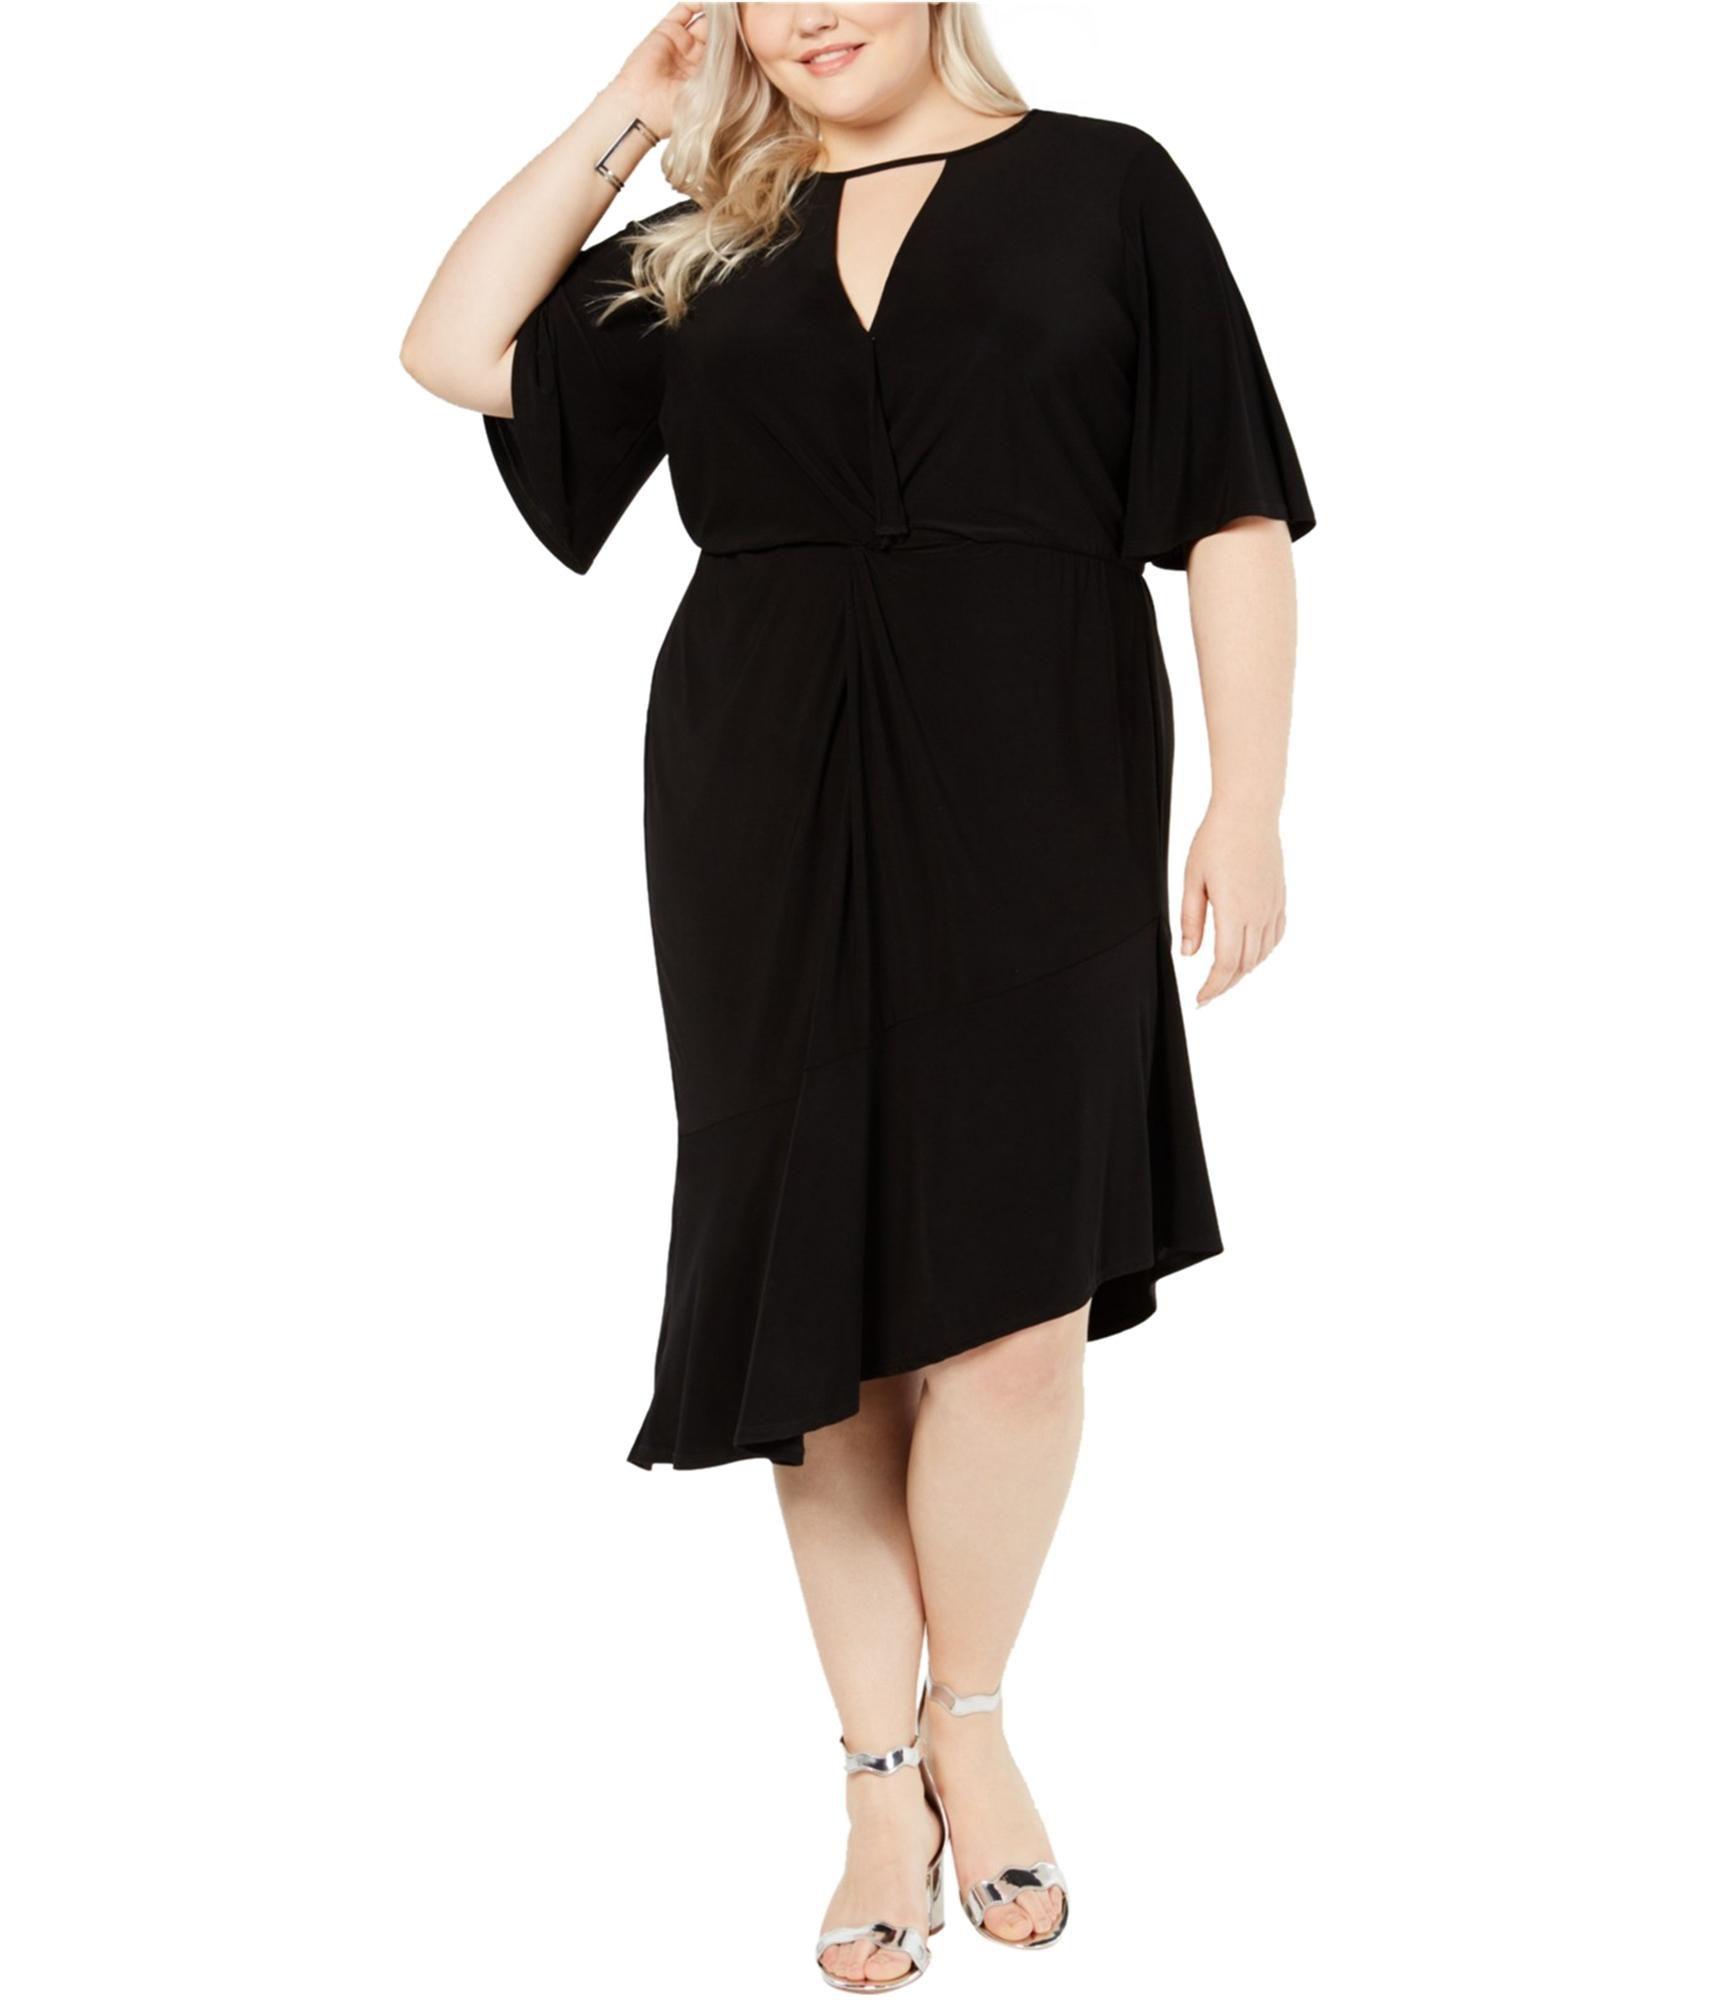 Love Squared Womens Twist-Front Asymmetrical Cocktail Dress, Black, 2X